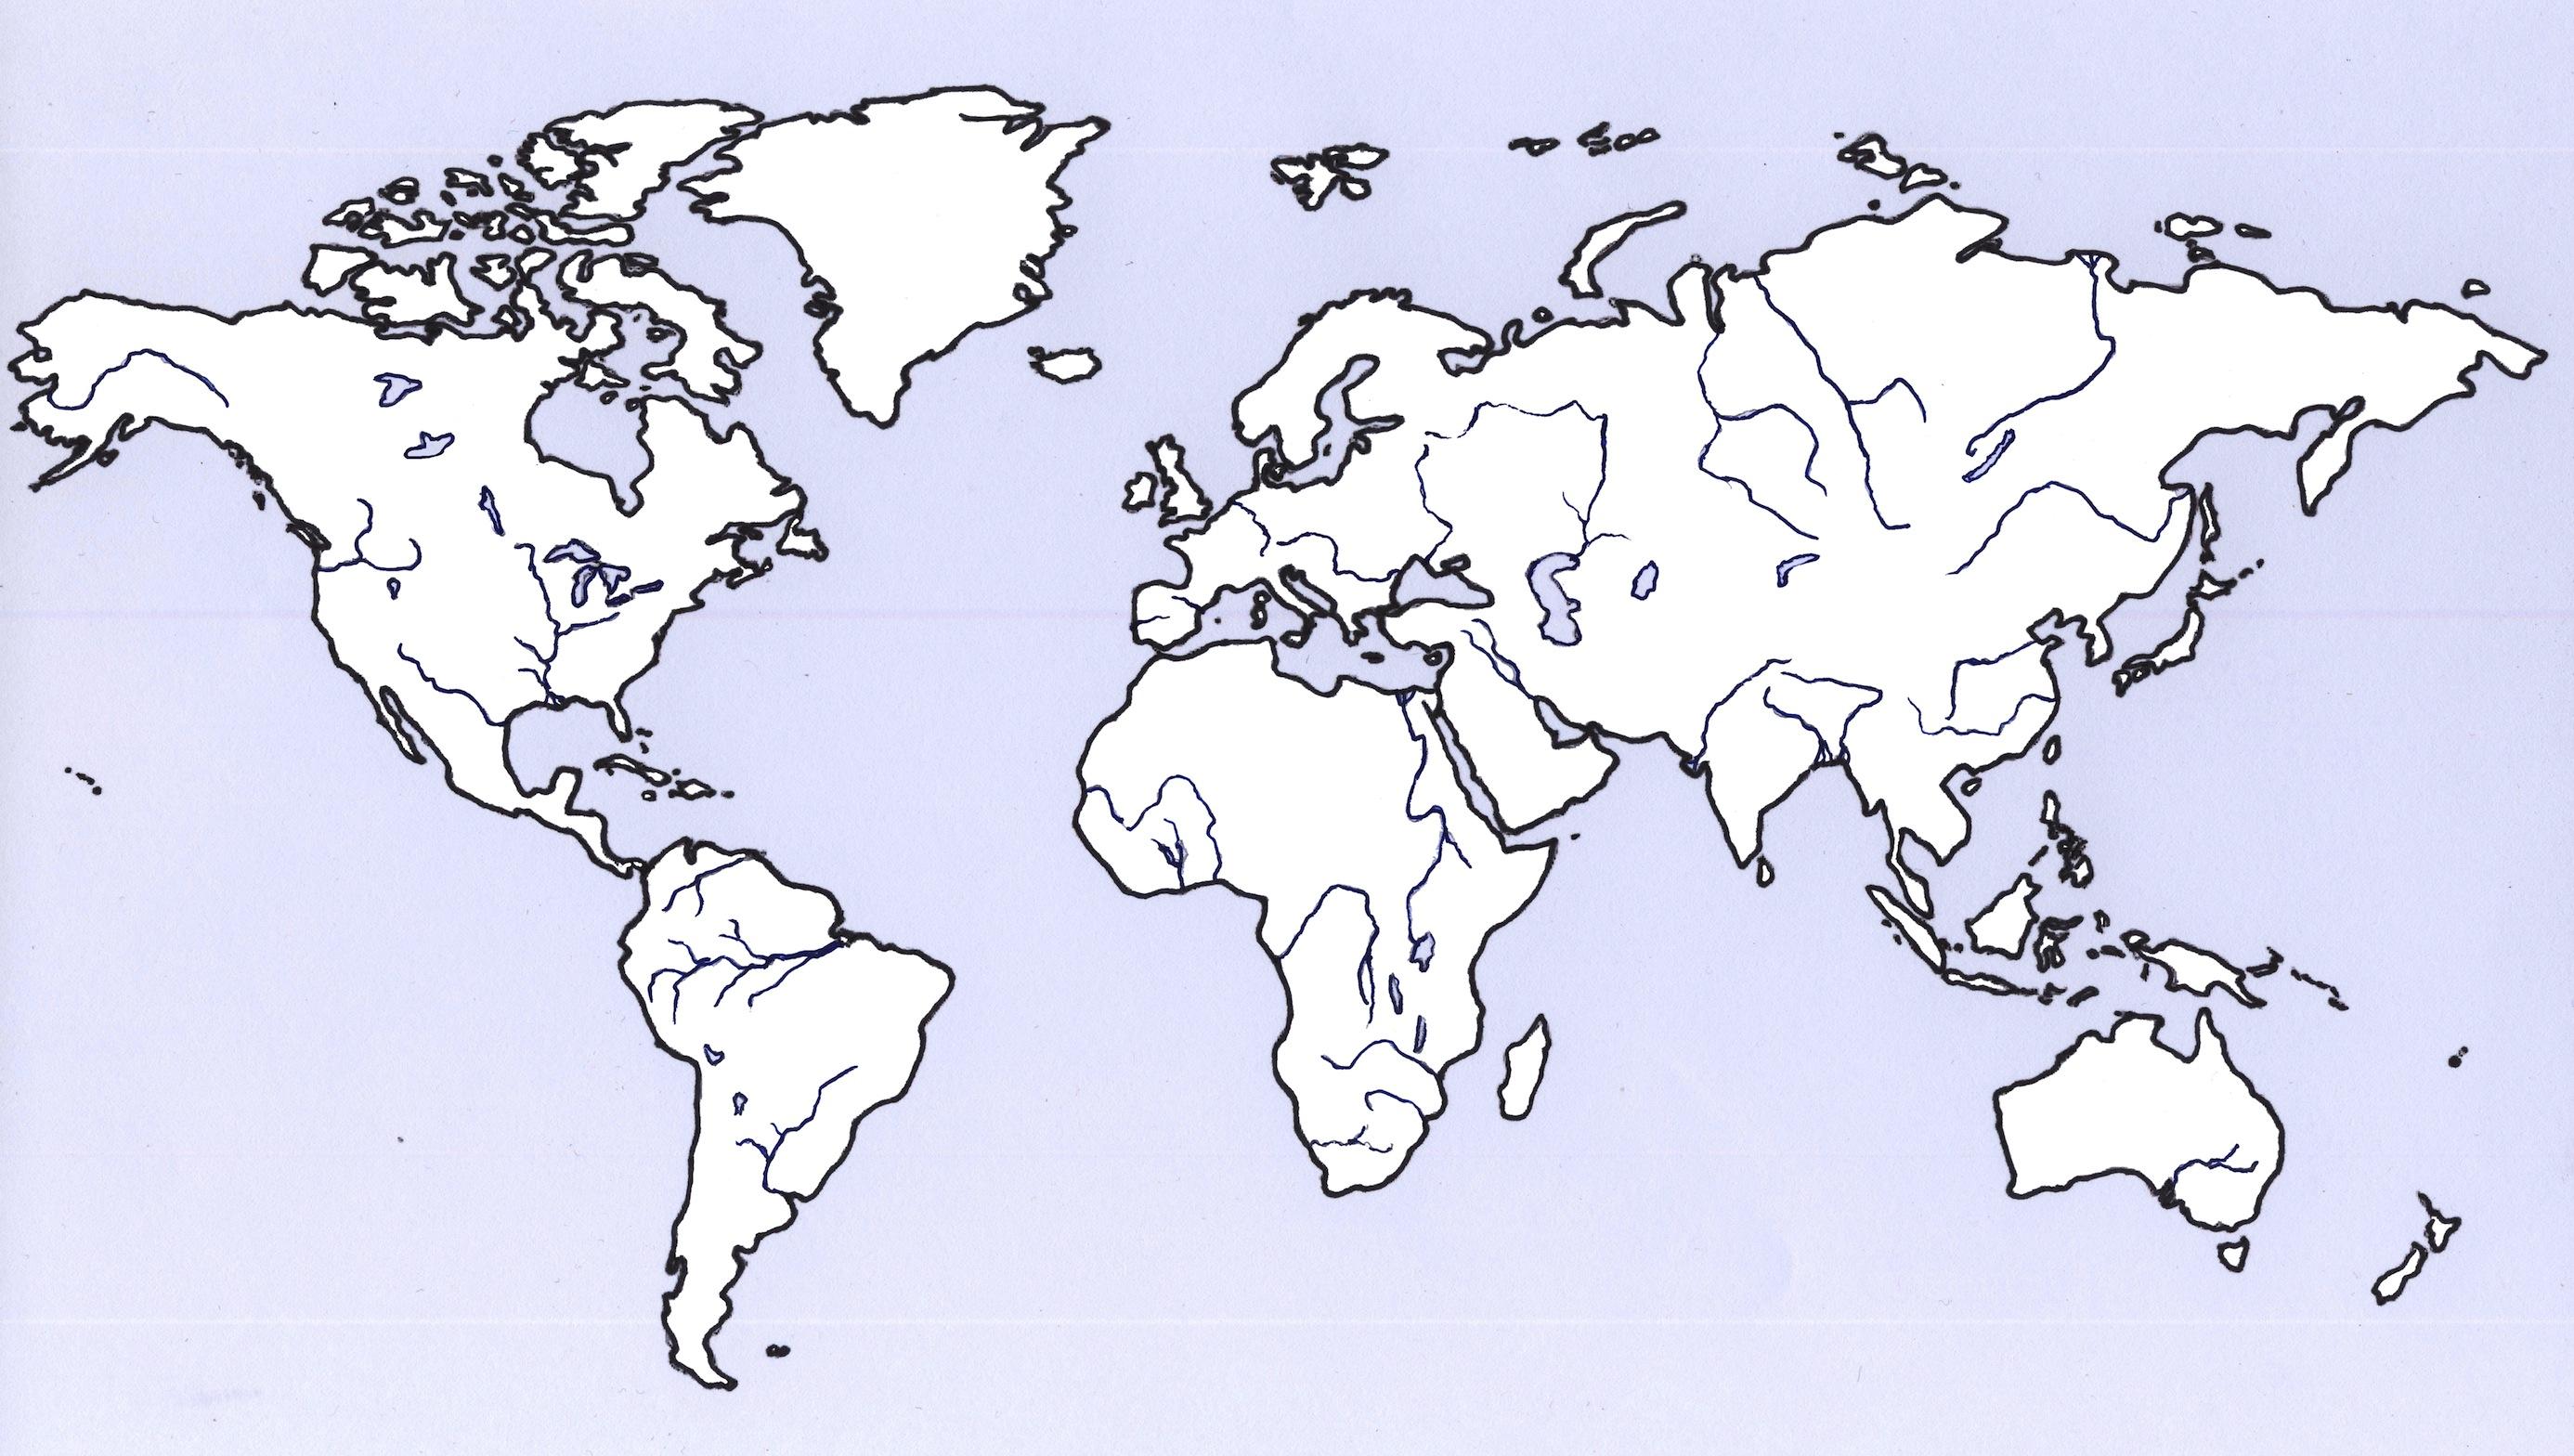 karta sveta sa kontinentima Osnovna škola Šestine Zagreb   Geografija karta sveta sa kontinentima